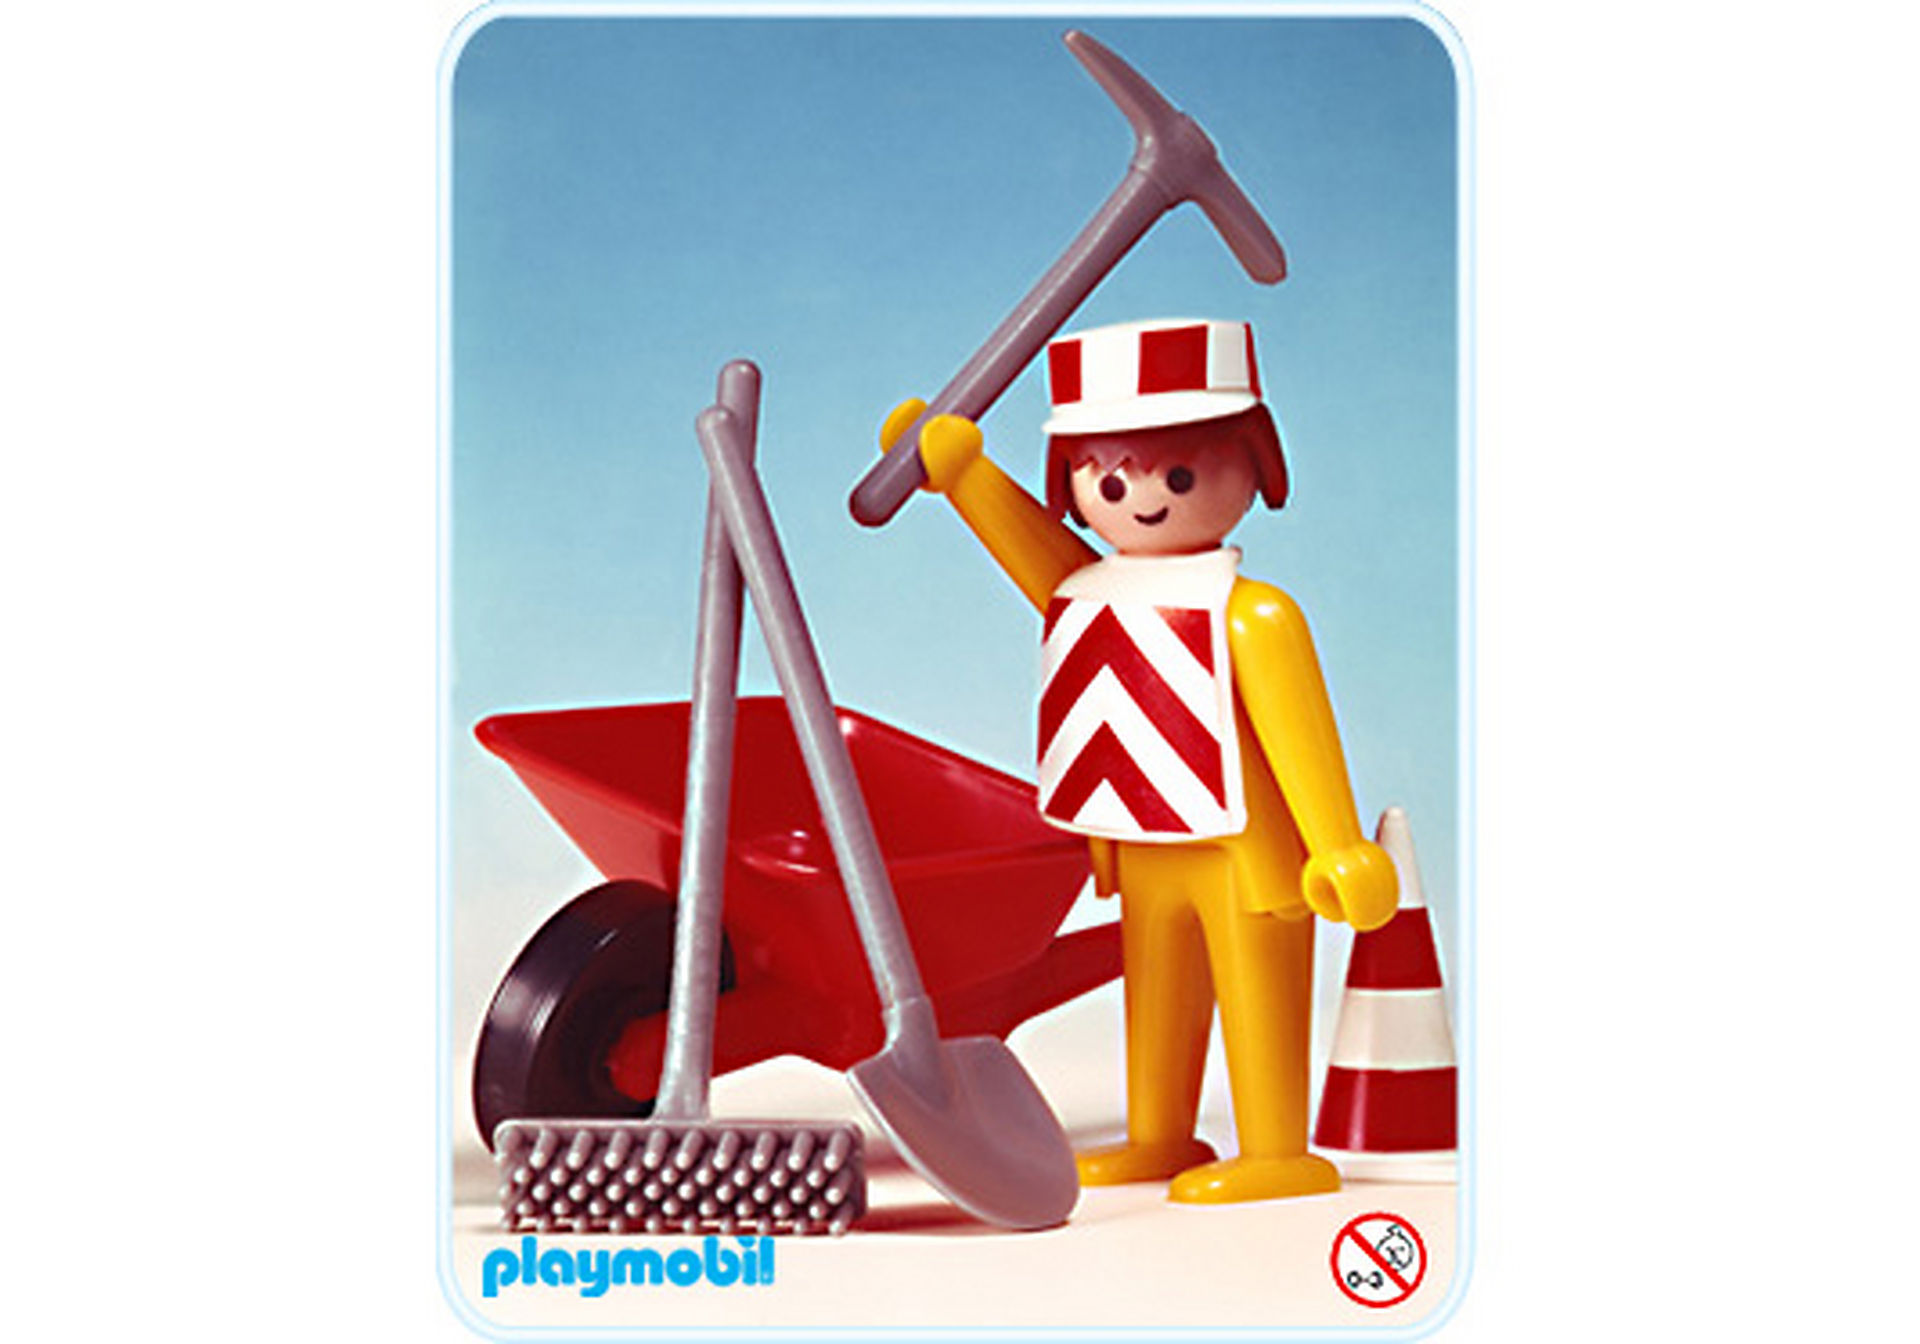 3313-A Straßenbauarbeiter/Schubkarren zoom image1